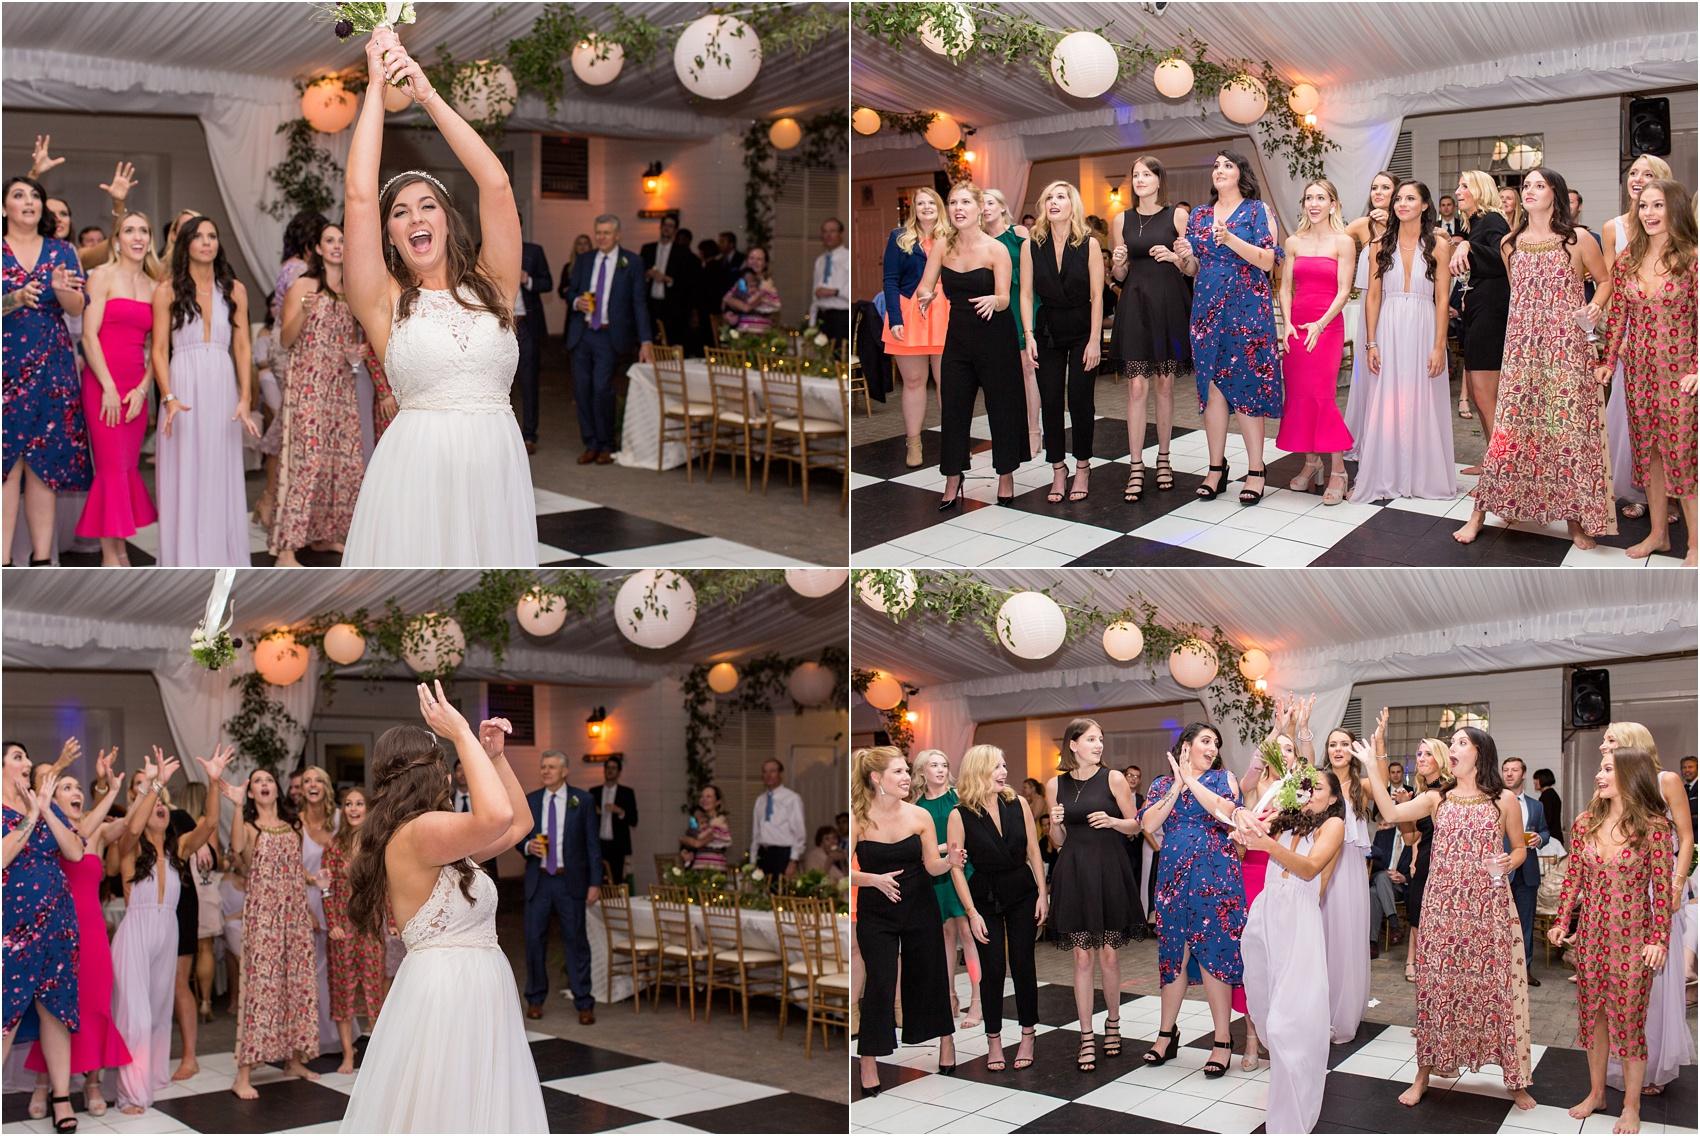 Savannah Eve Photography- Groseclose Wedding- Blog-112.jpg